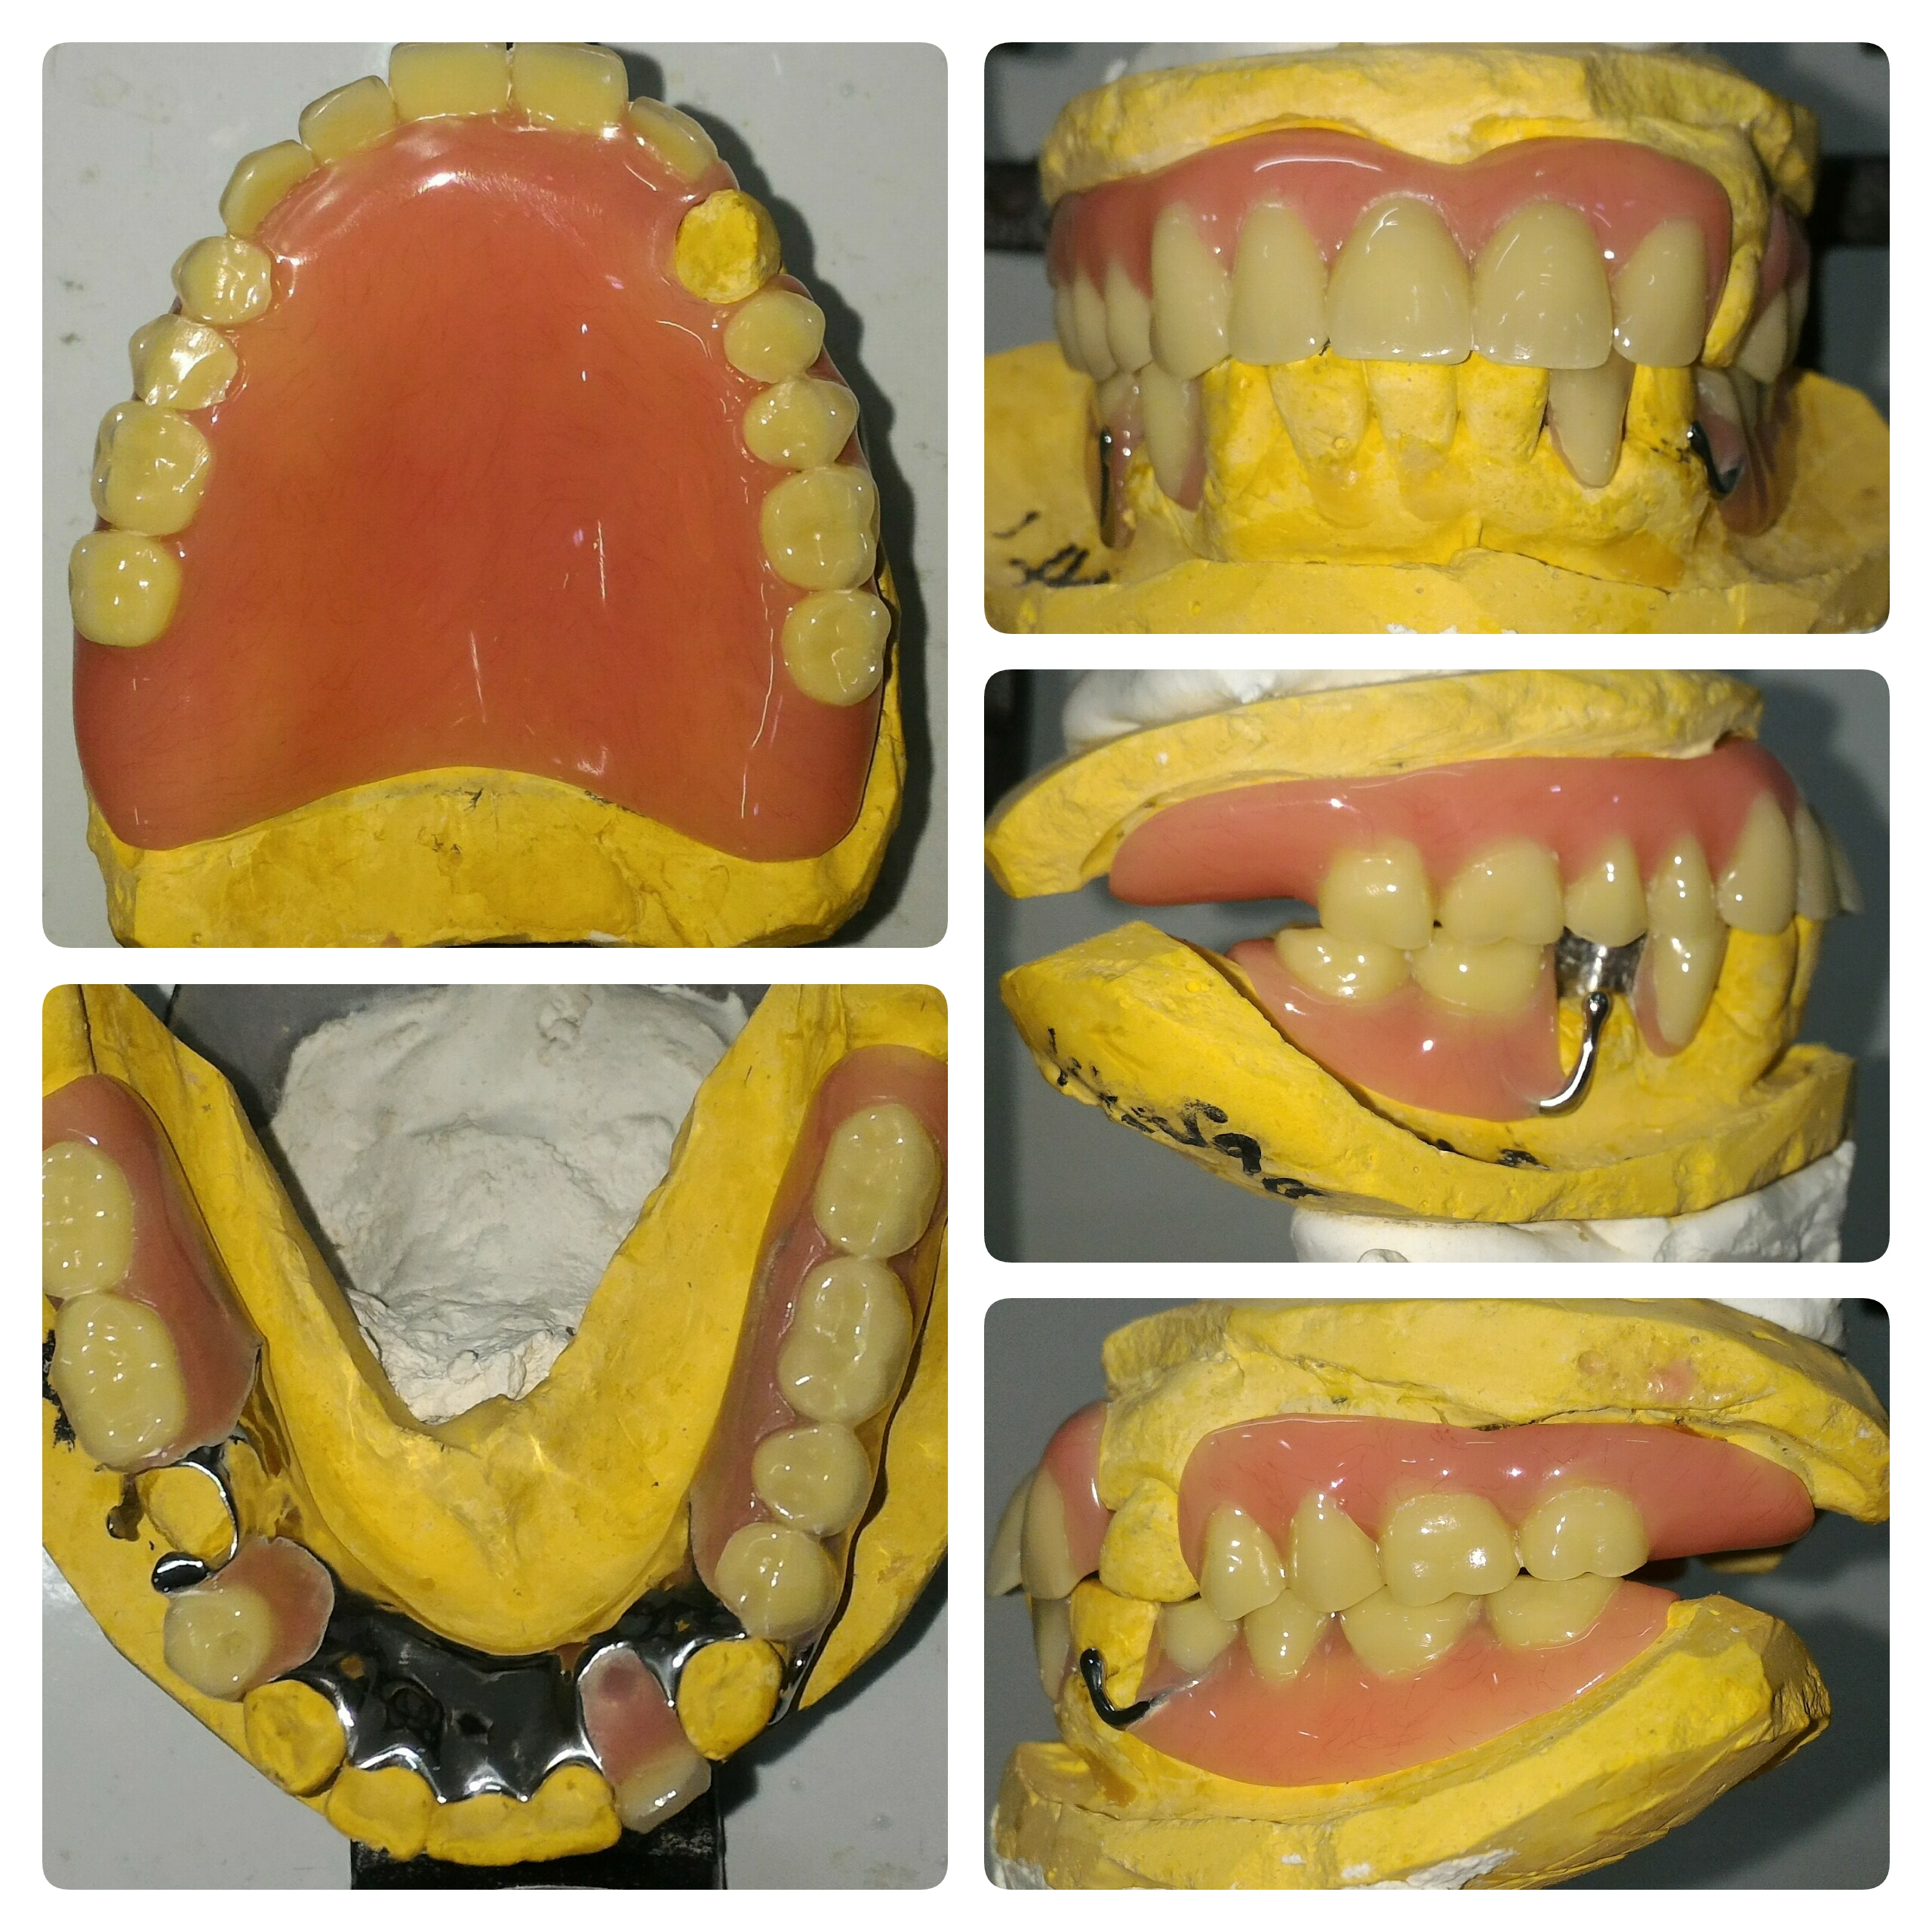 r.catalan denture collage plain